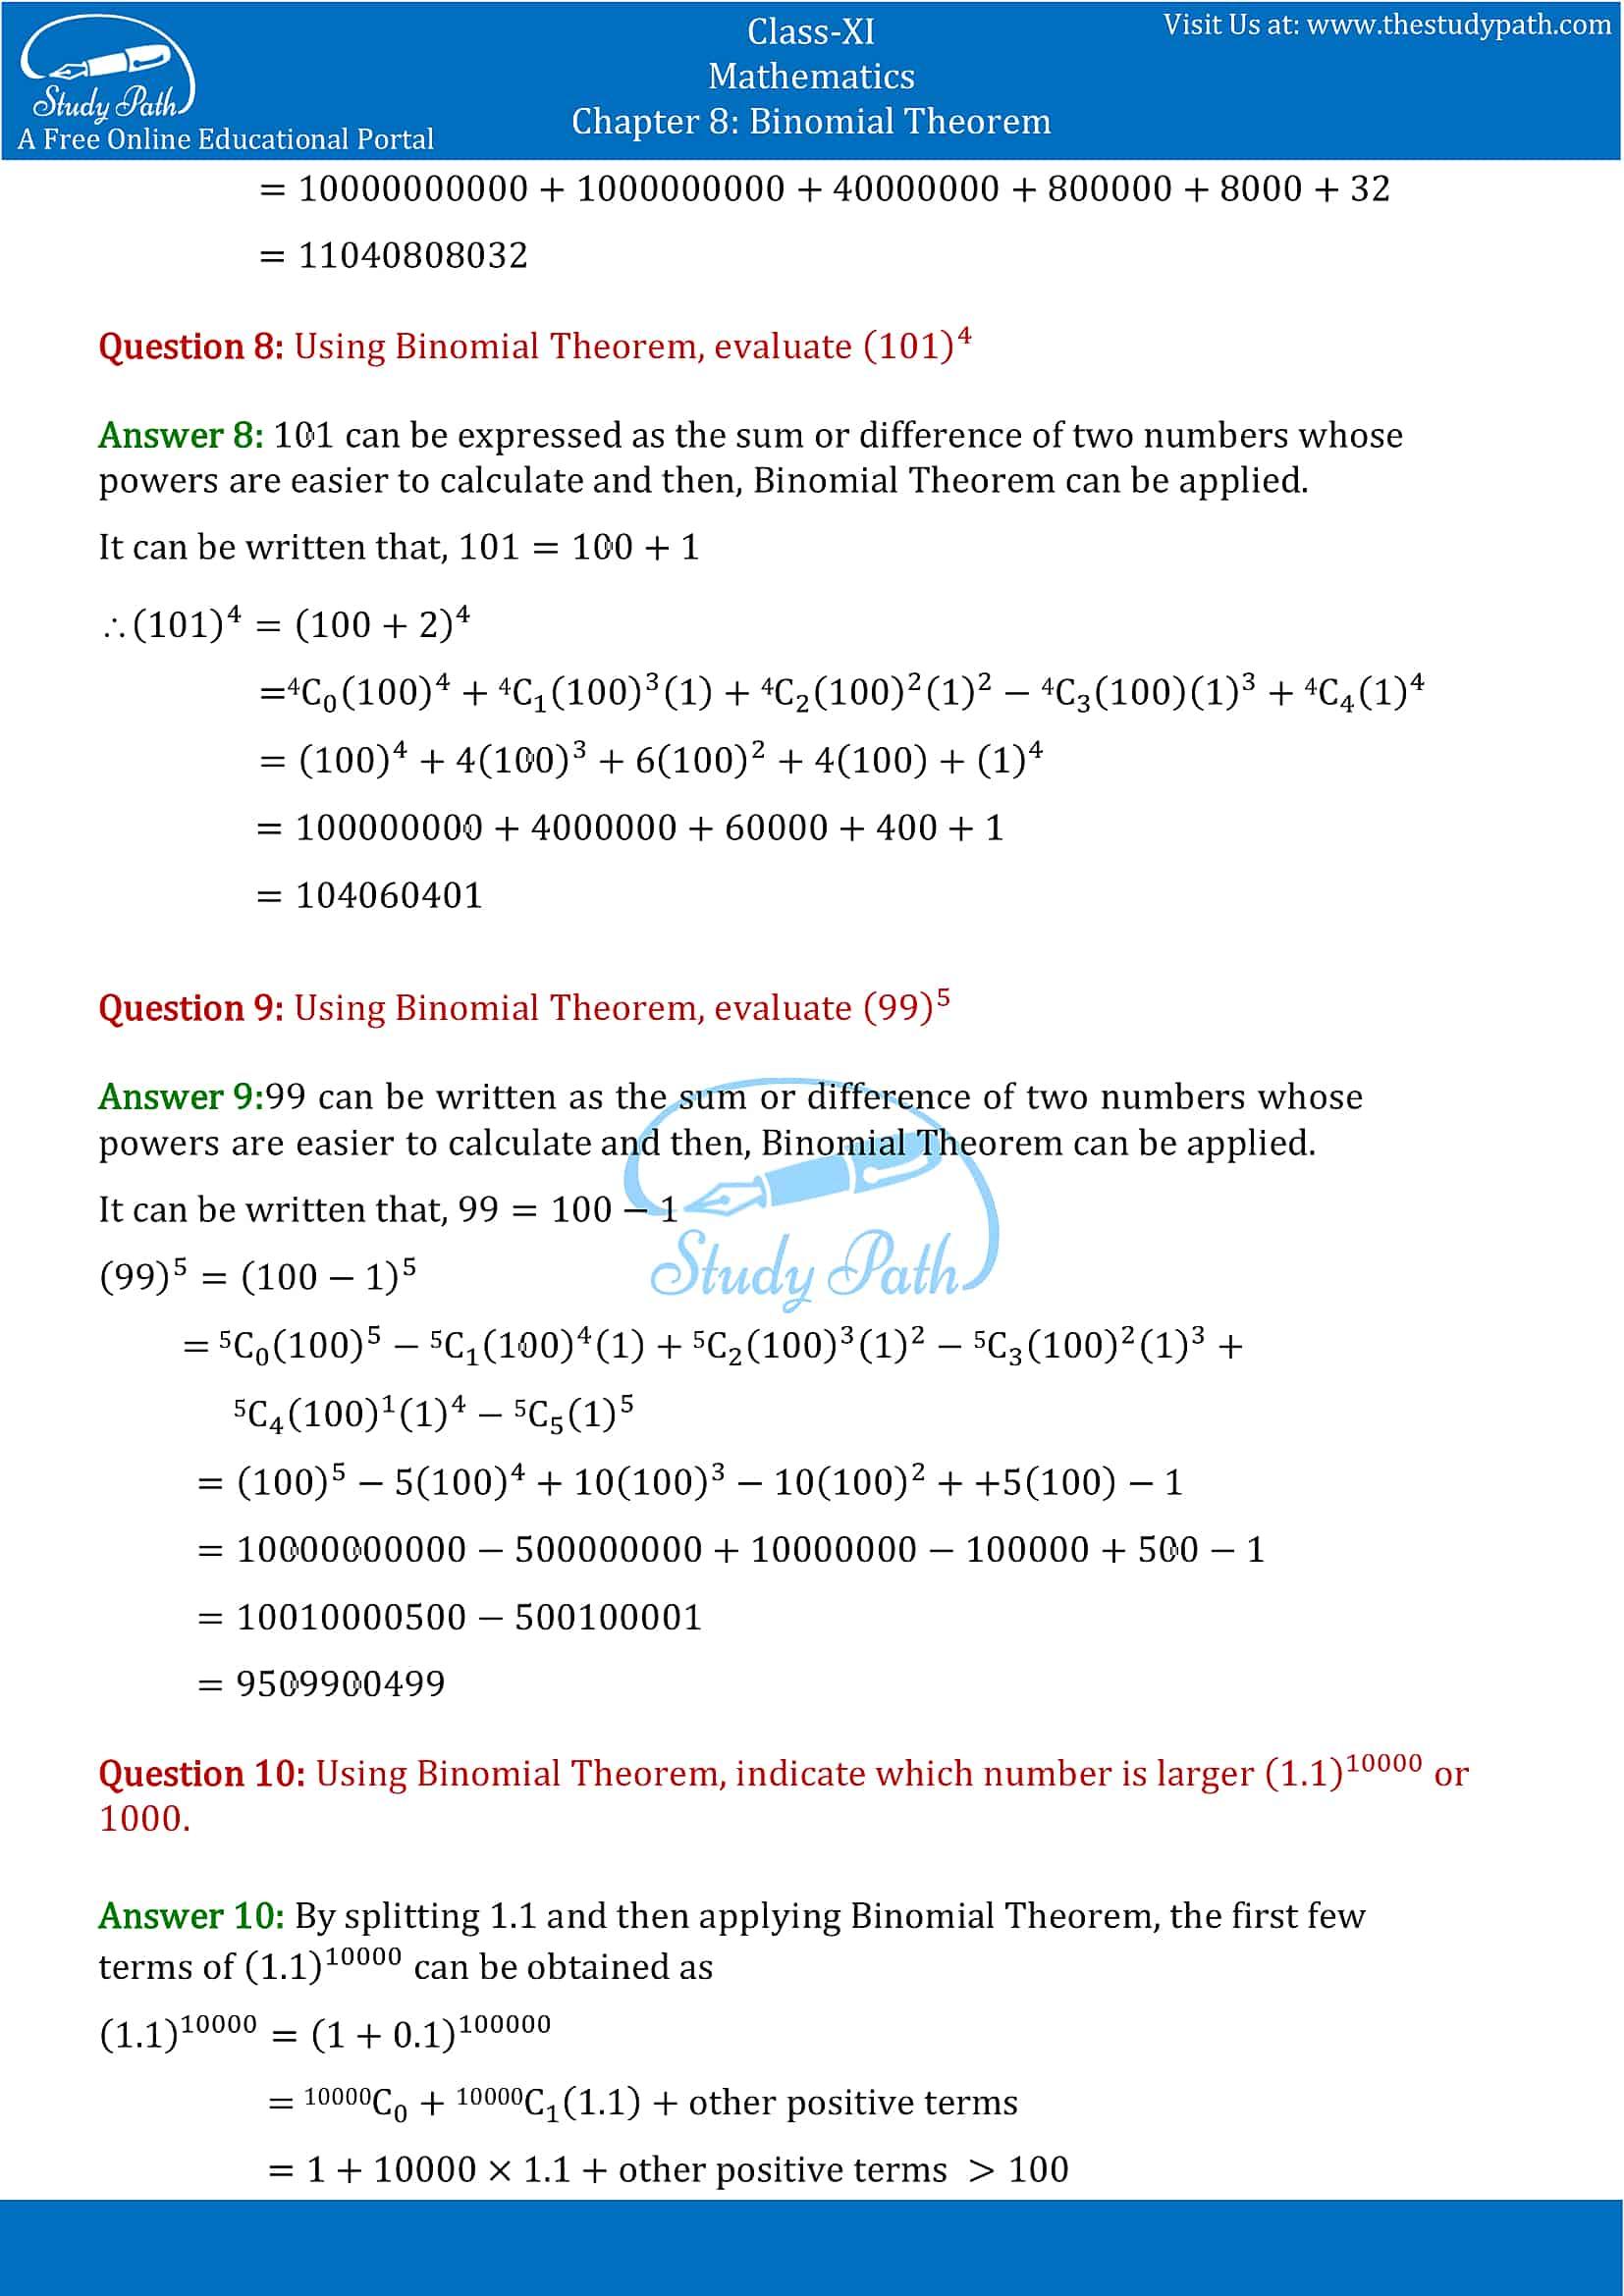 NCERT Solutions for Class 11 Maths chapter 8 Binomial Theorem part-3